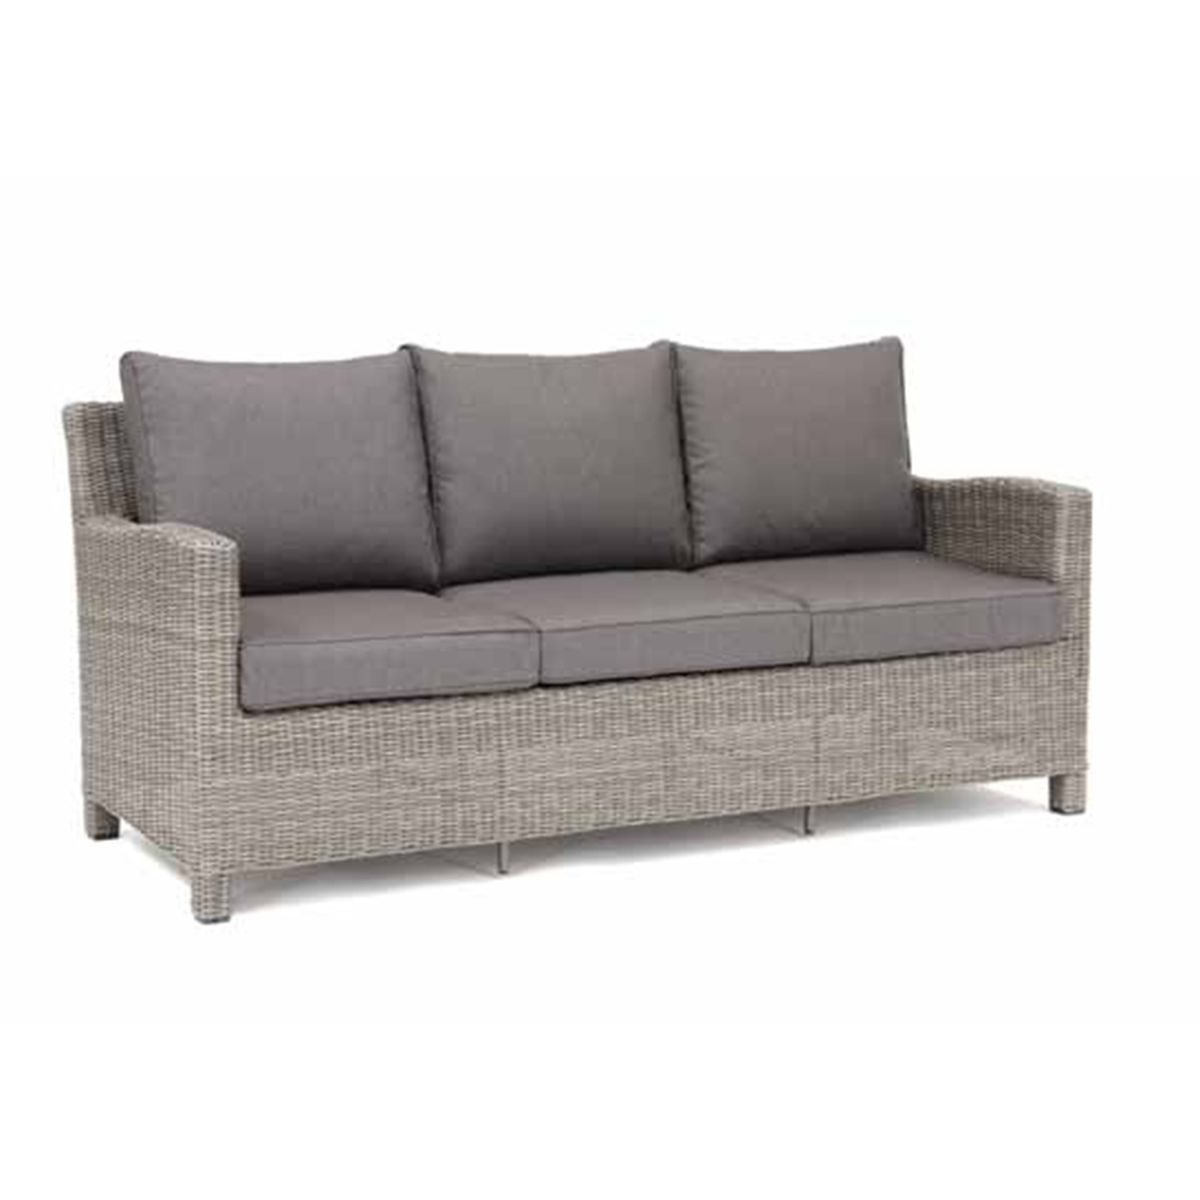 Palma 3 Seat Sofa in white wash